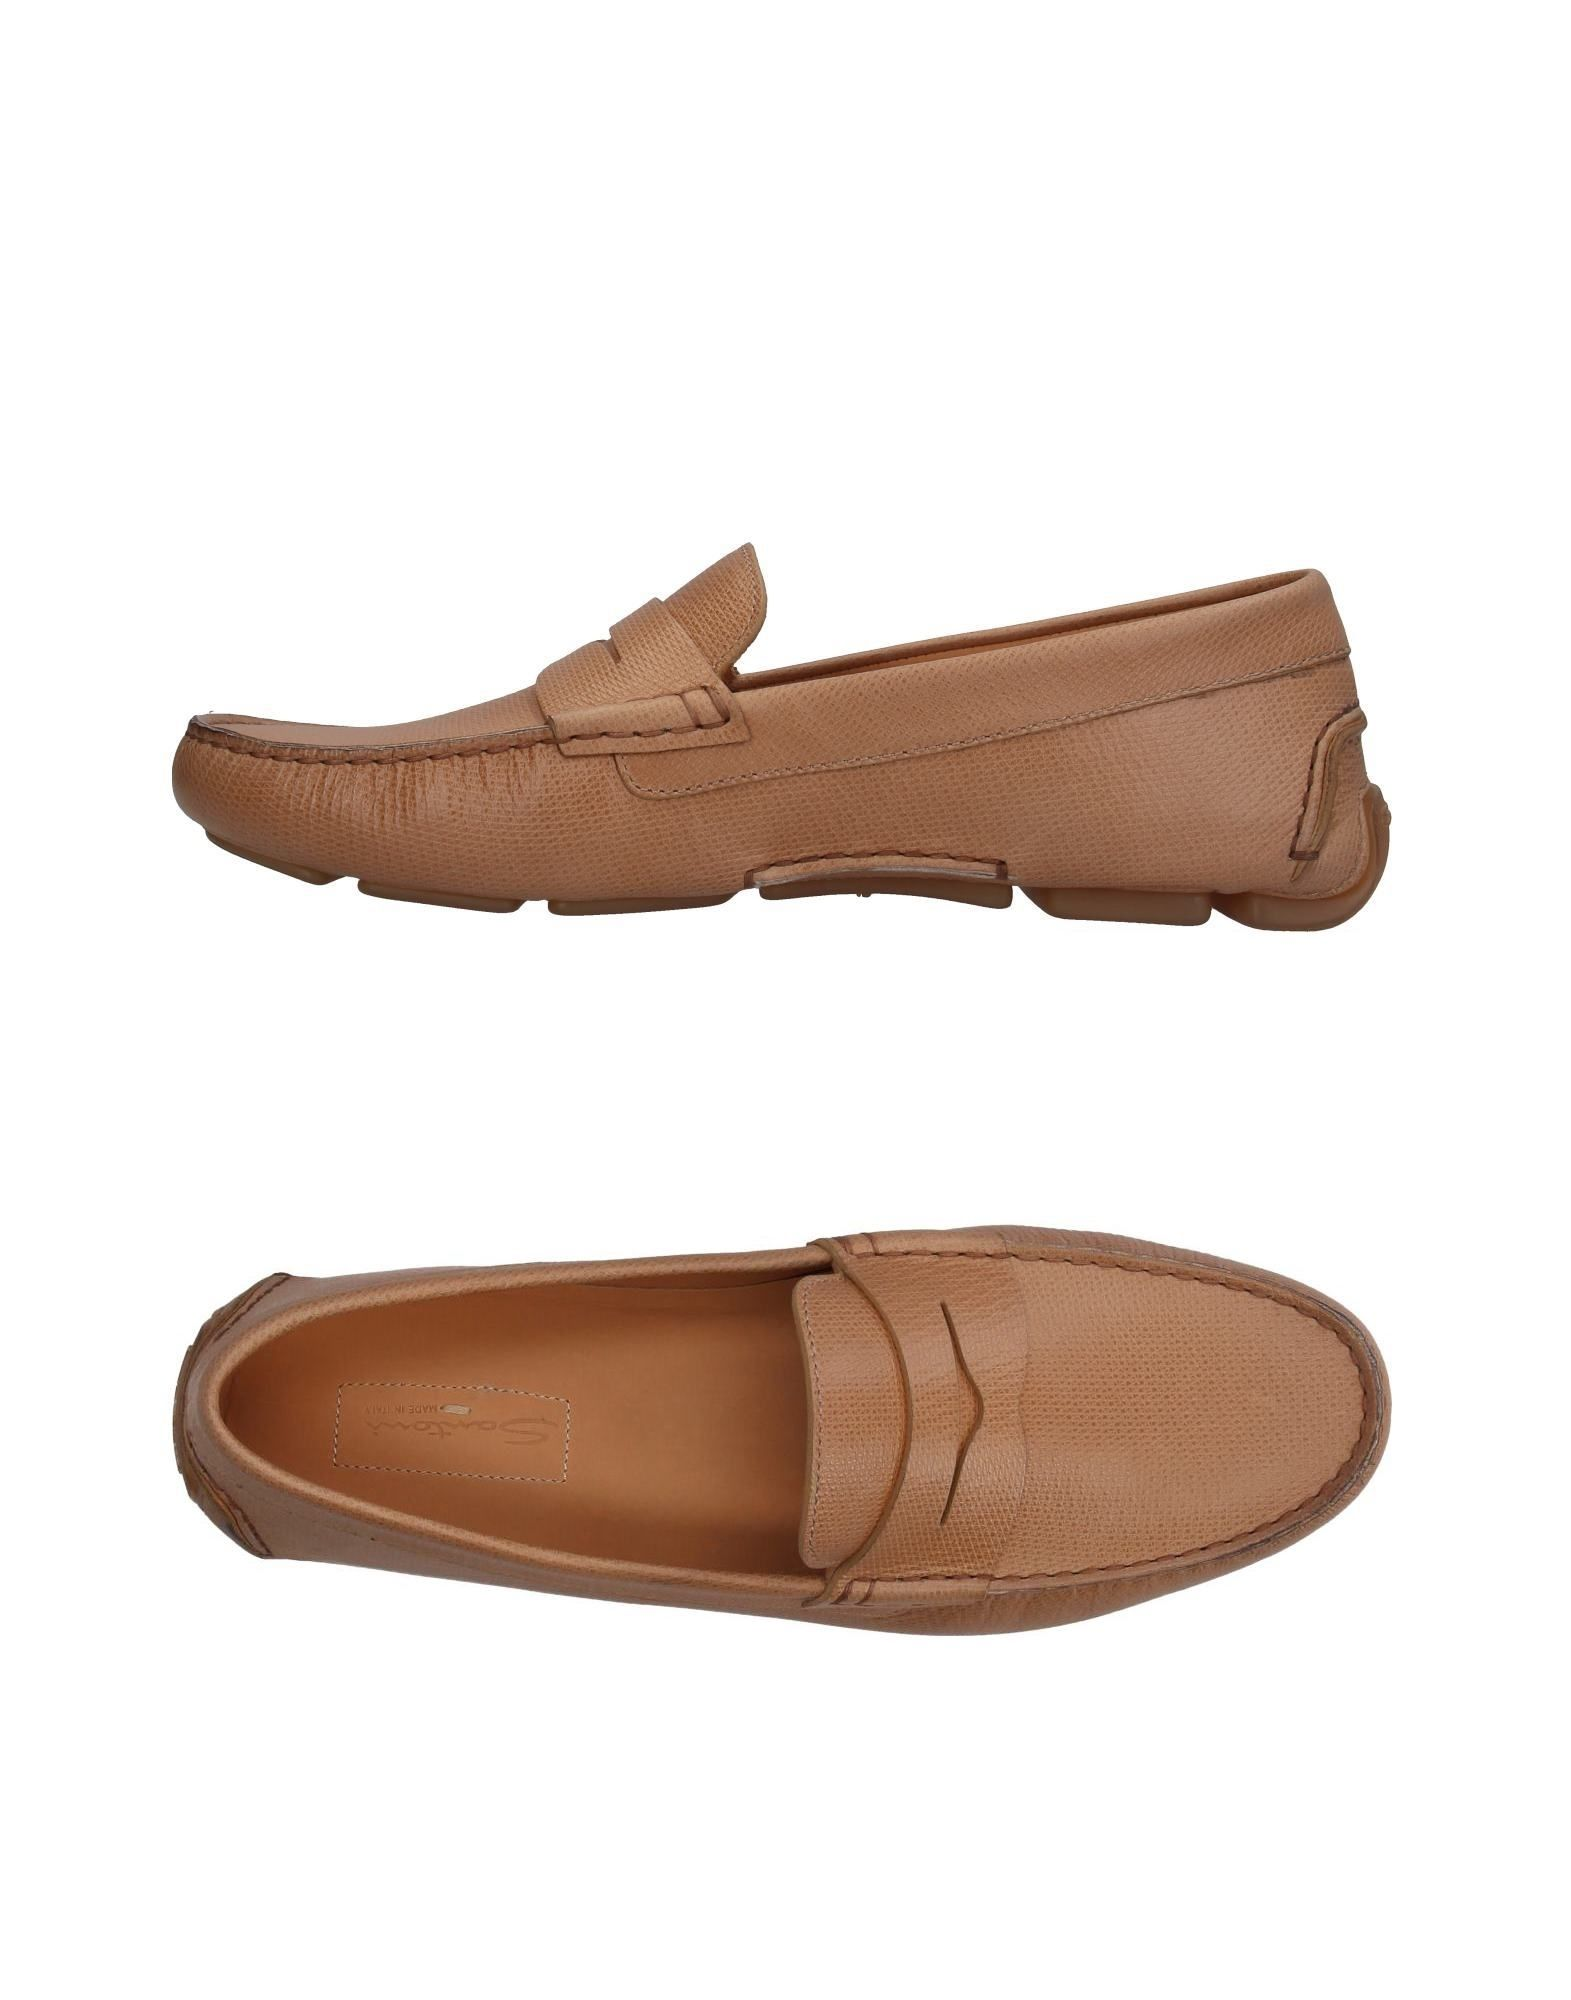 Santoni Mokassins Herren  11409708MG Gute Qualität beliebte Schuhe